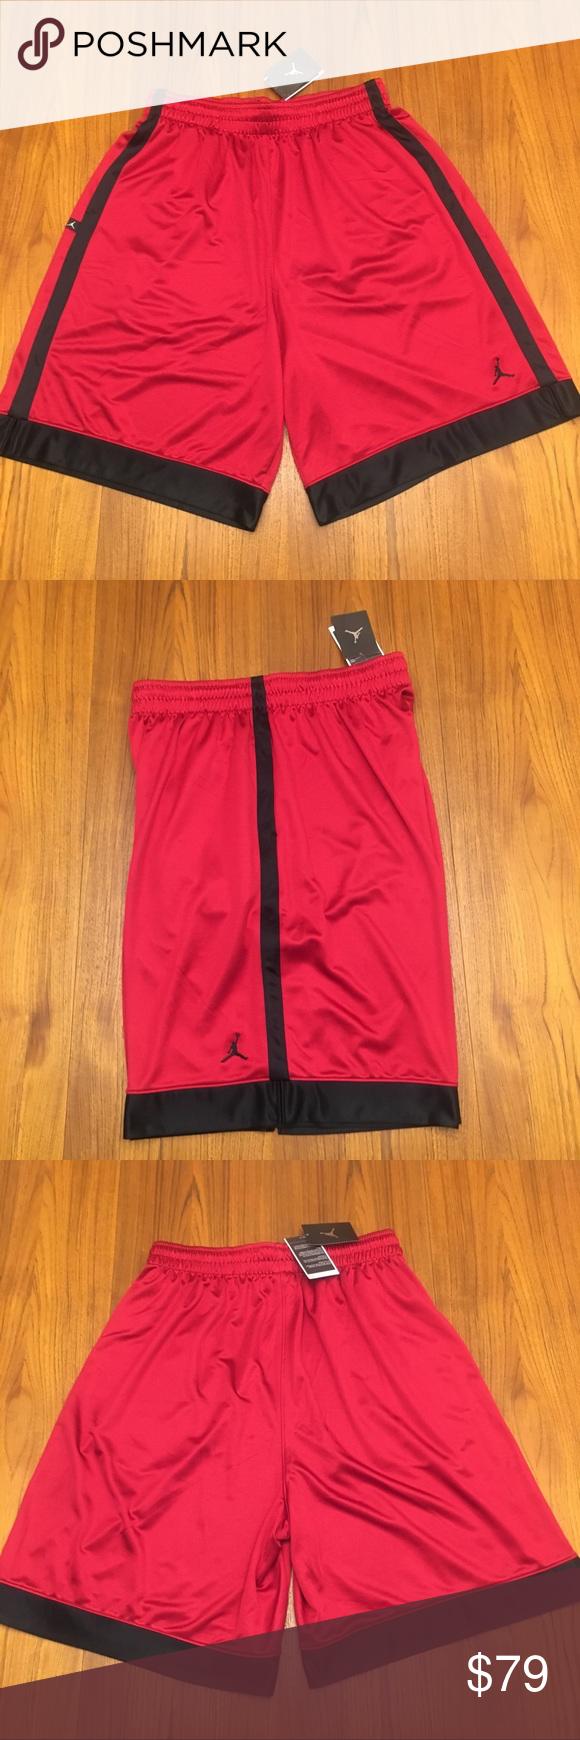 Sold Rare Nwt Vintage Nike Jordan Shorts 2006 Xl In 2020 Vintage Nike Jordan Shorts Shorts